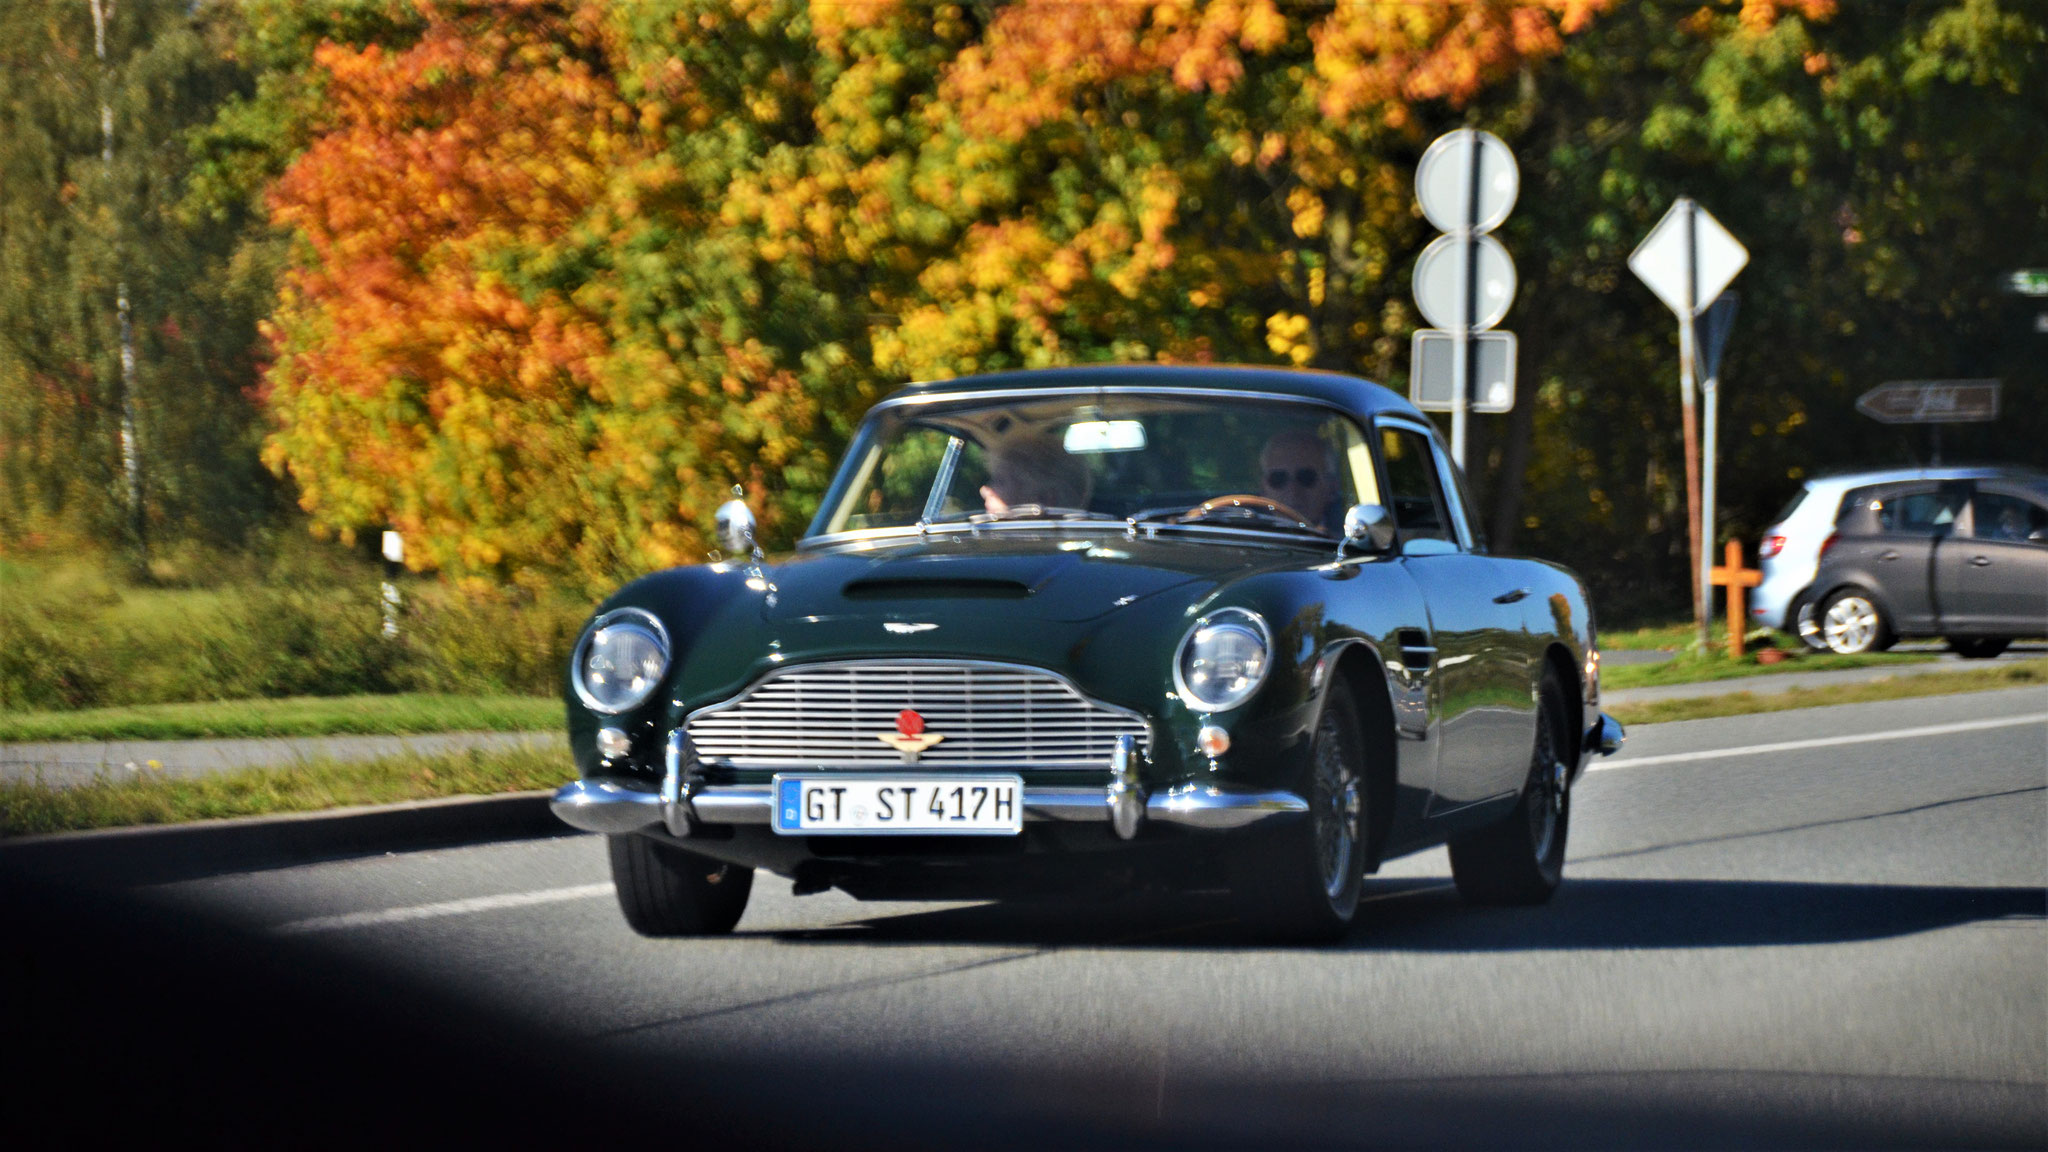 Aston Martin DB5 - GT-ST-417H